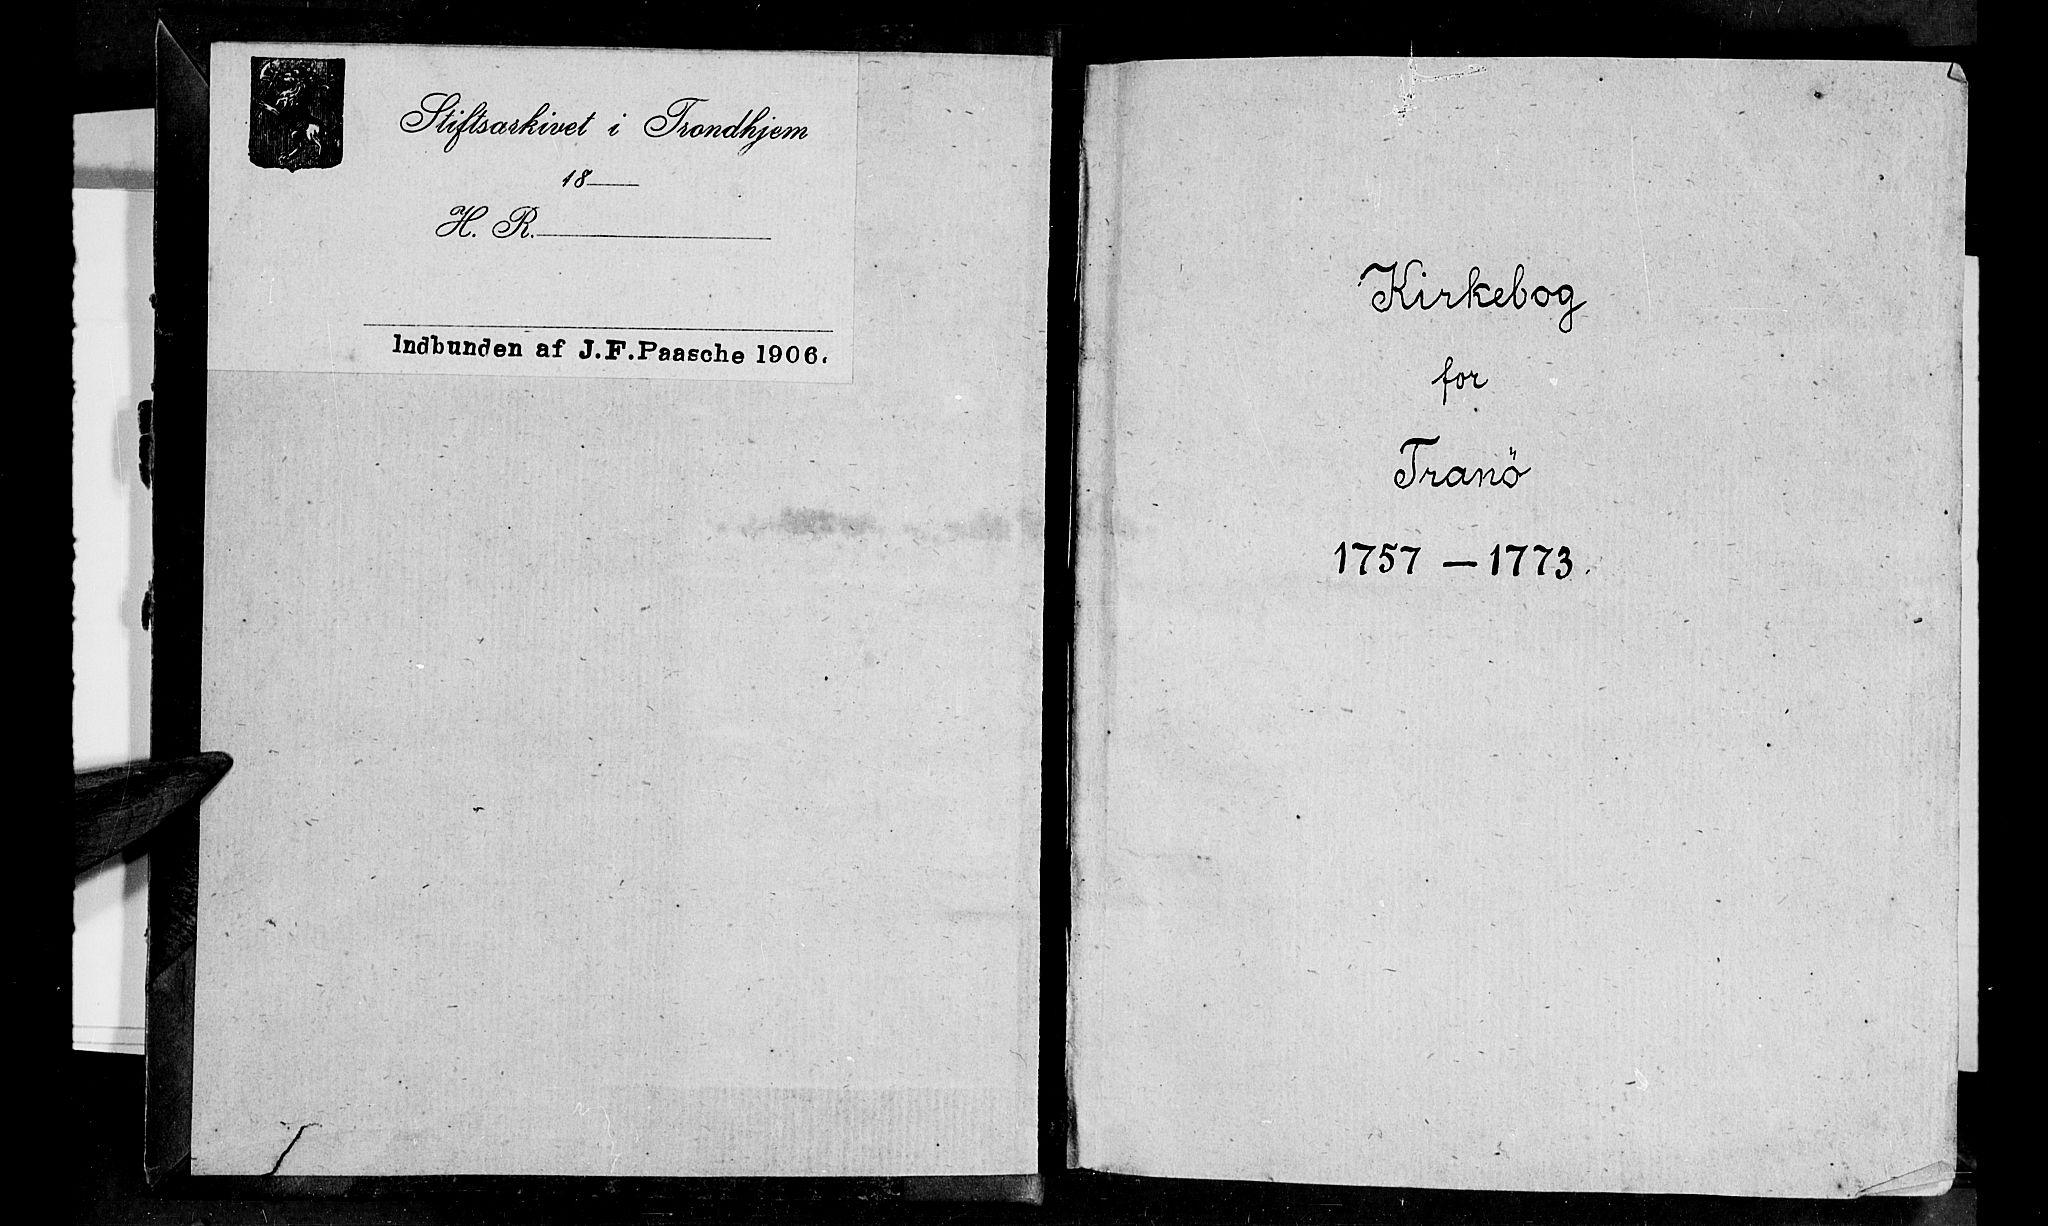 SATØ, Tranøy sokneprestkontor, I/Ia/Iaa/L0001kirke: Ministerialbok nr. 1, 1757-1773